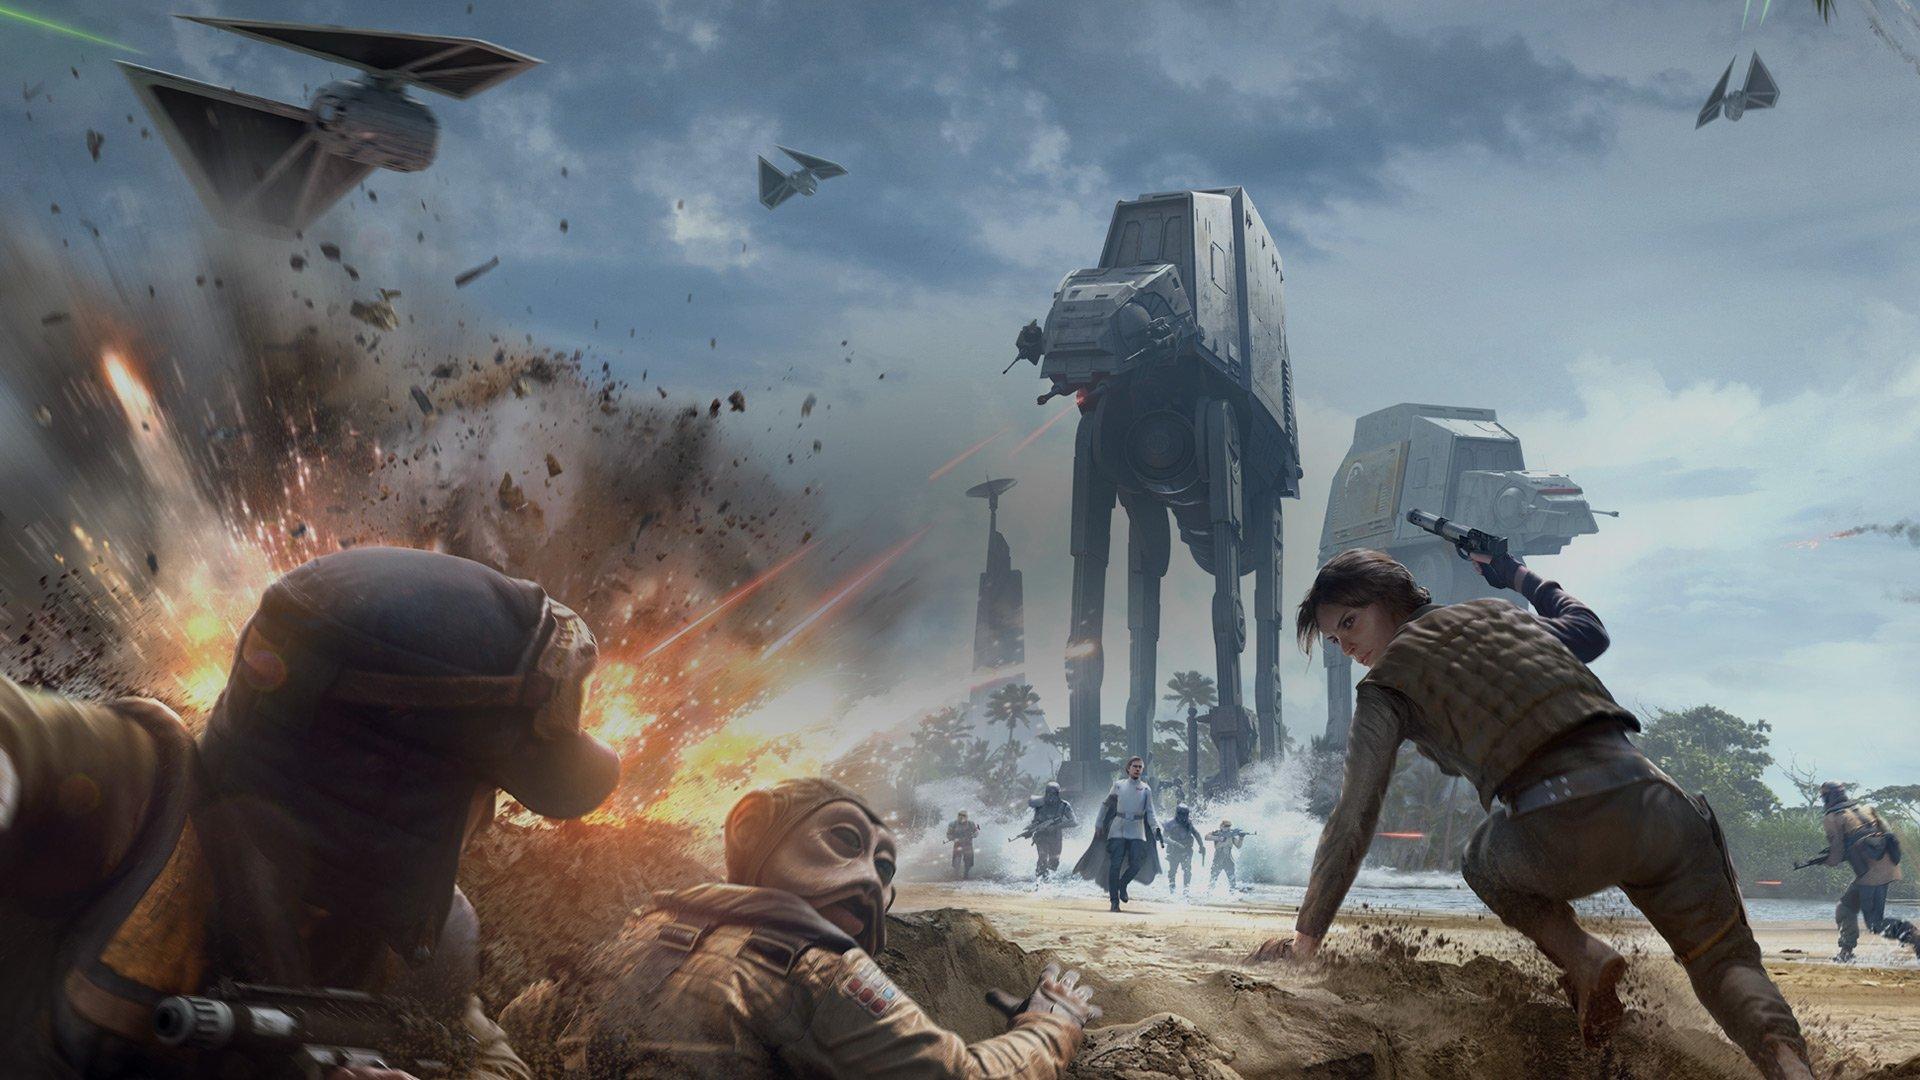 Rogue One Scarif Update Arrives For Star Wars Battlefront